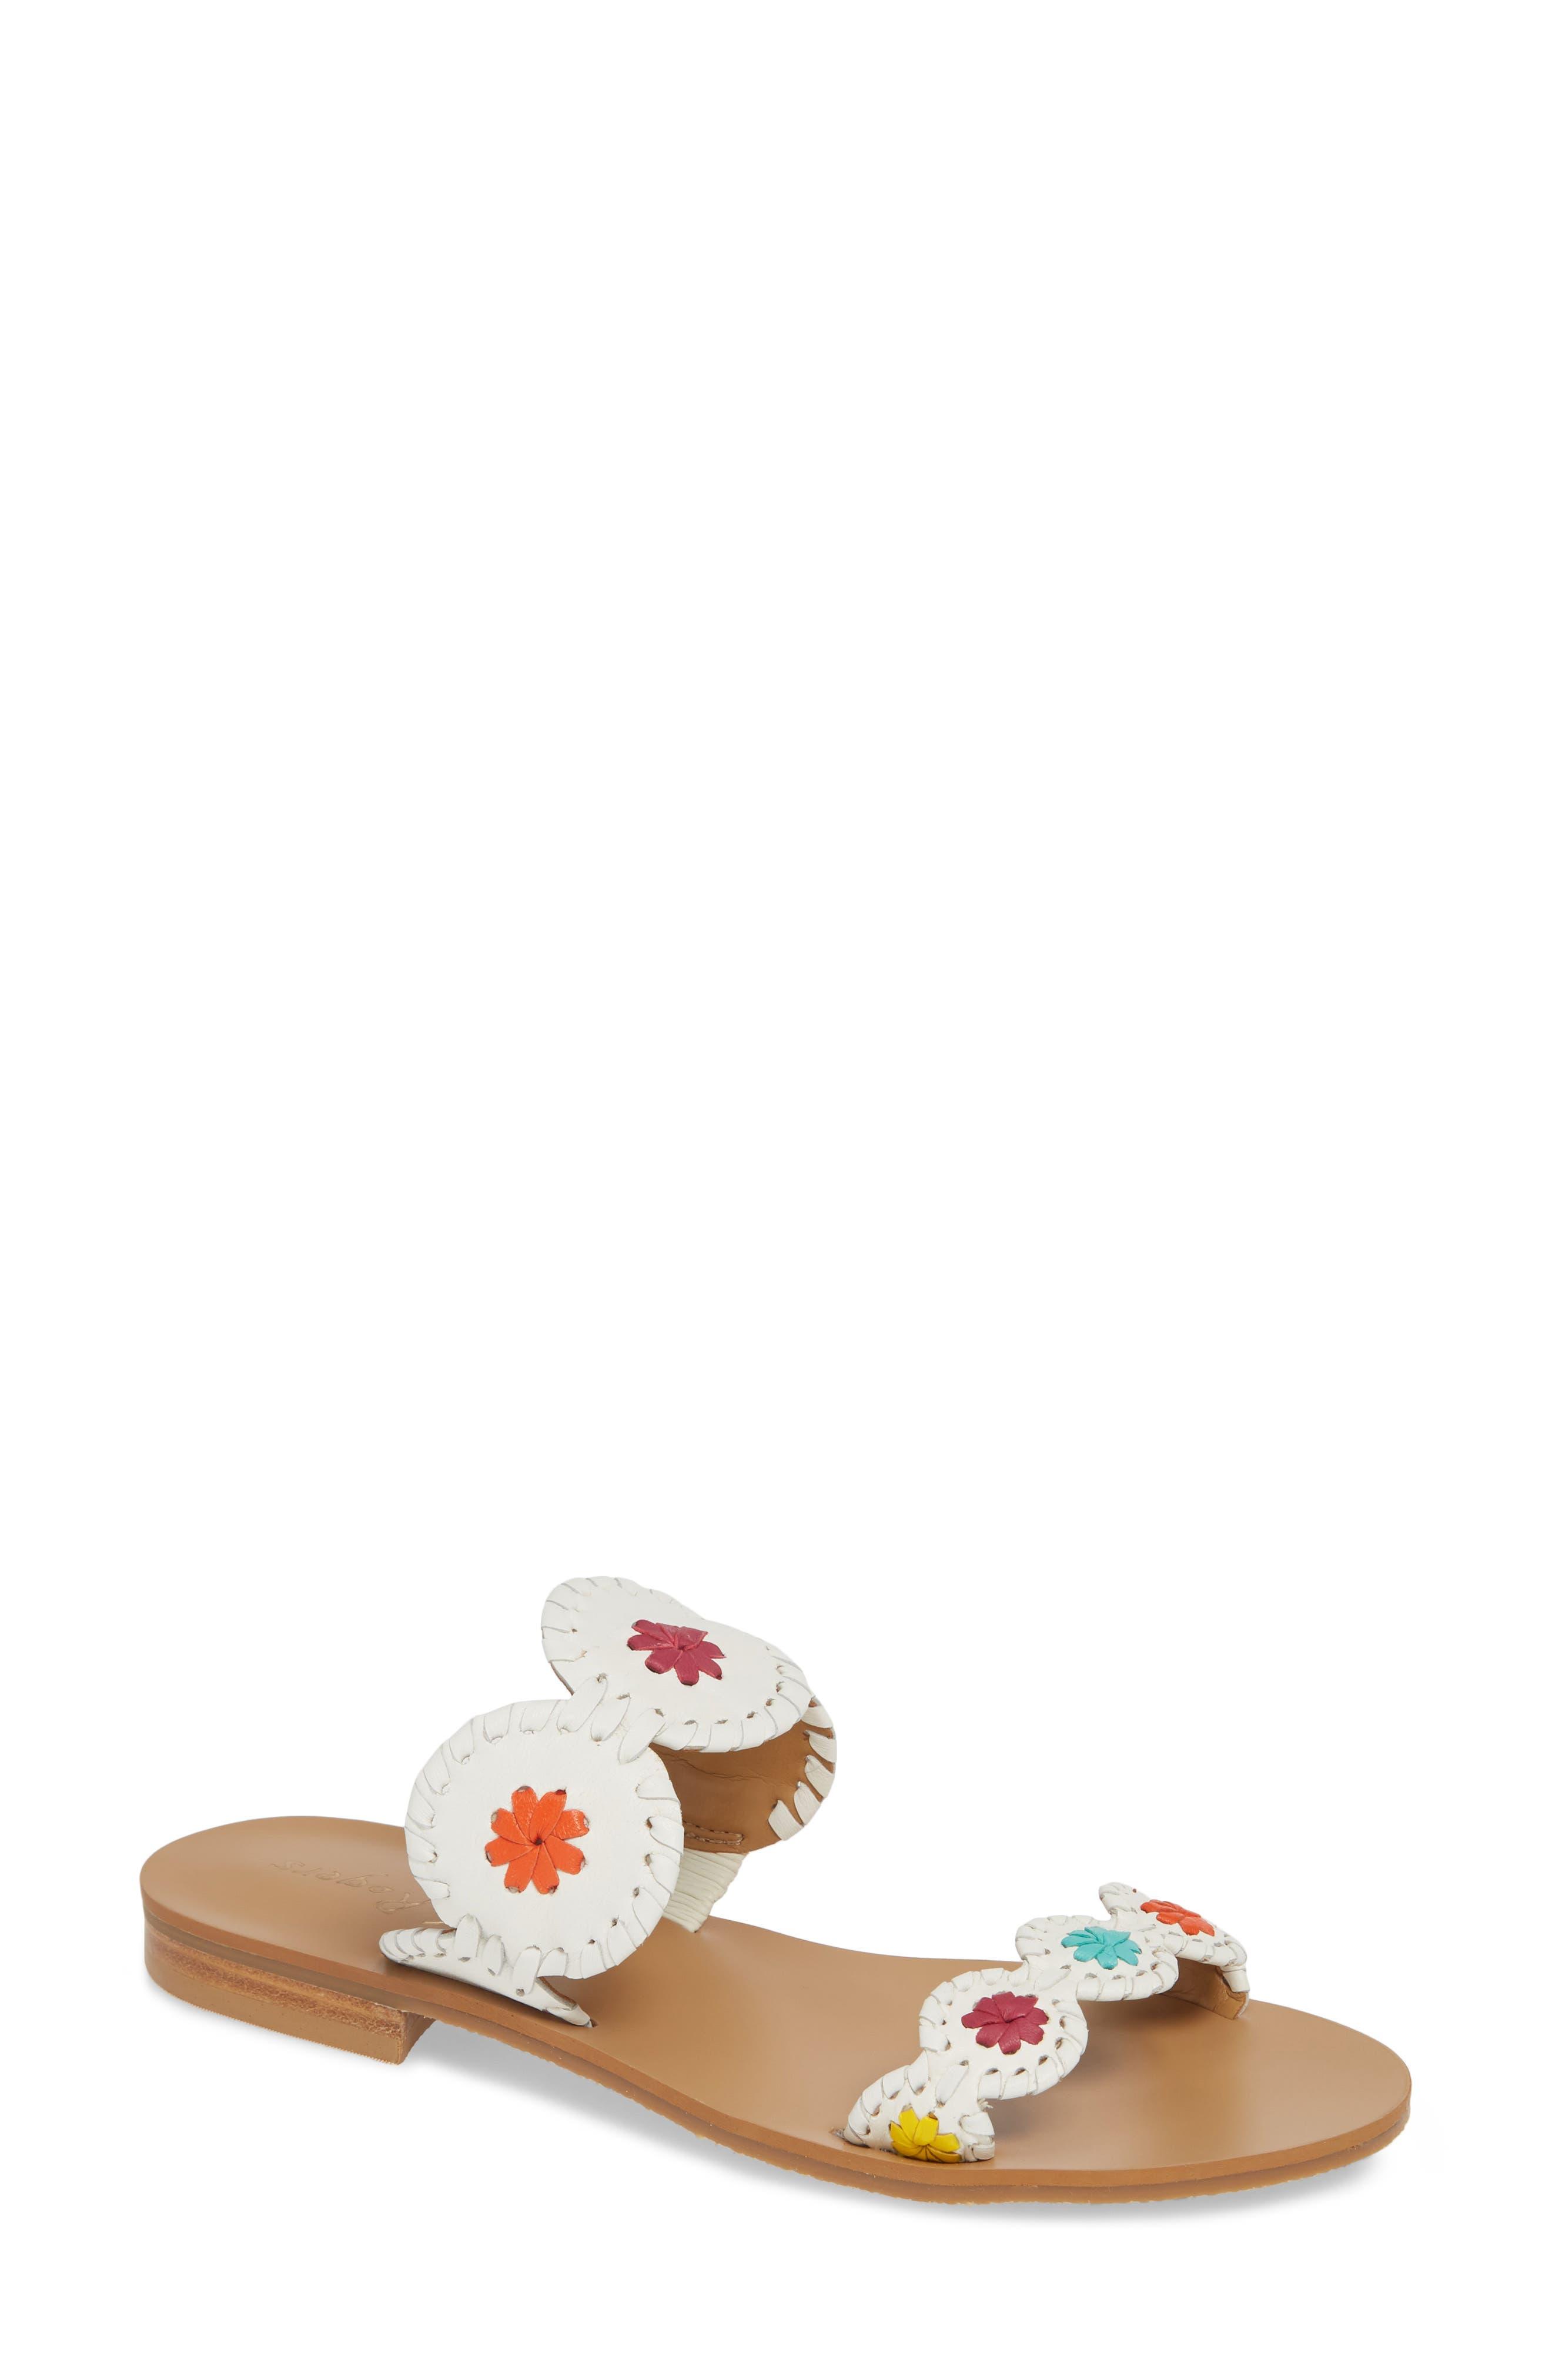 'Lauren' Sandal, Main, color, WHITE MULTI LEATHER